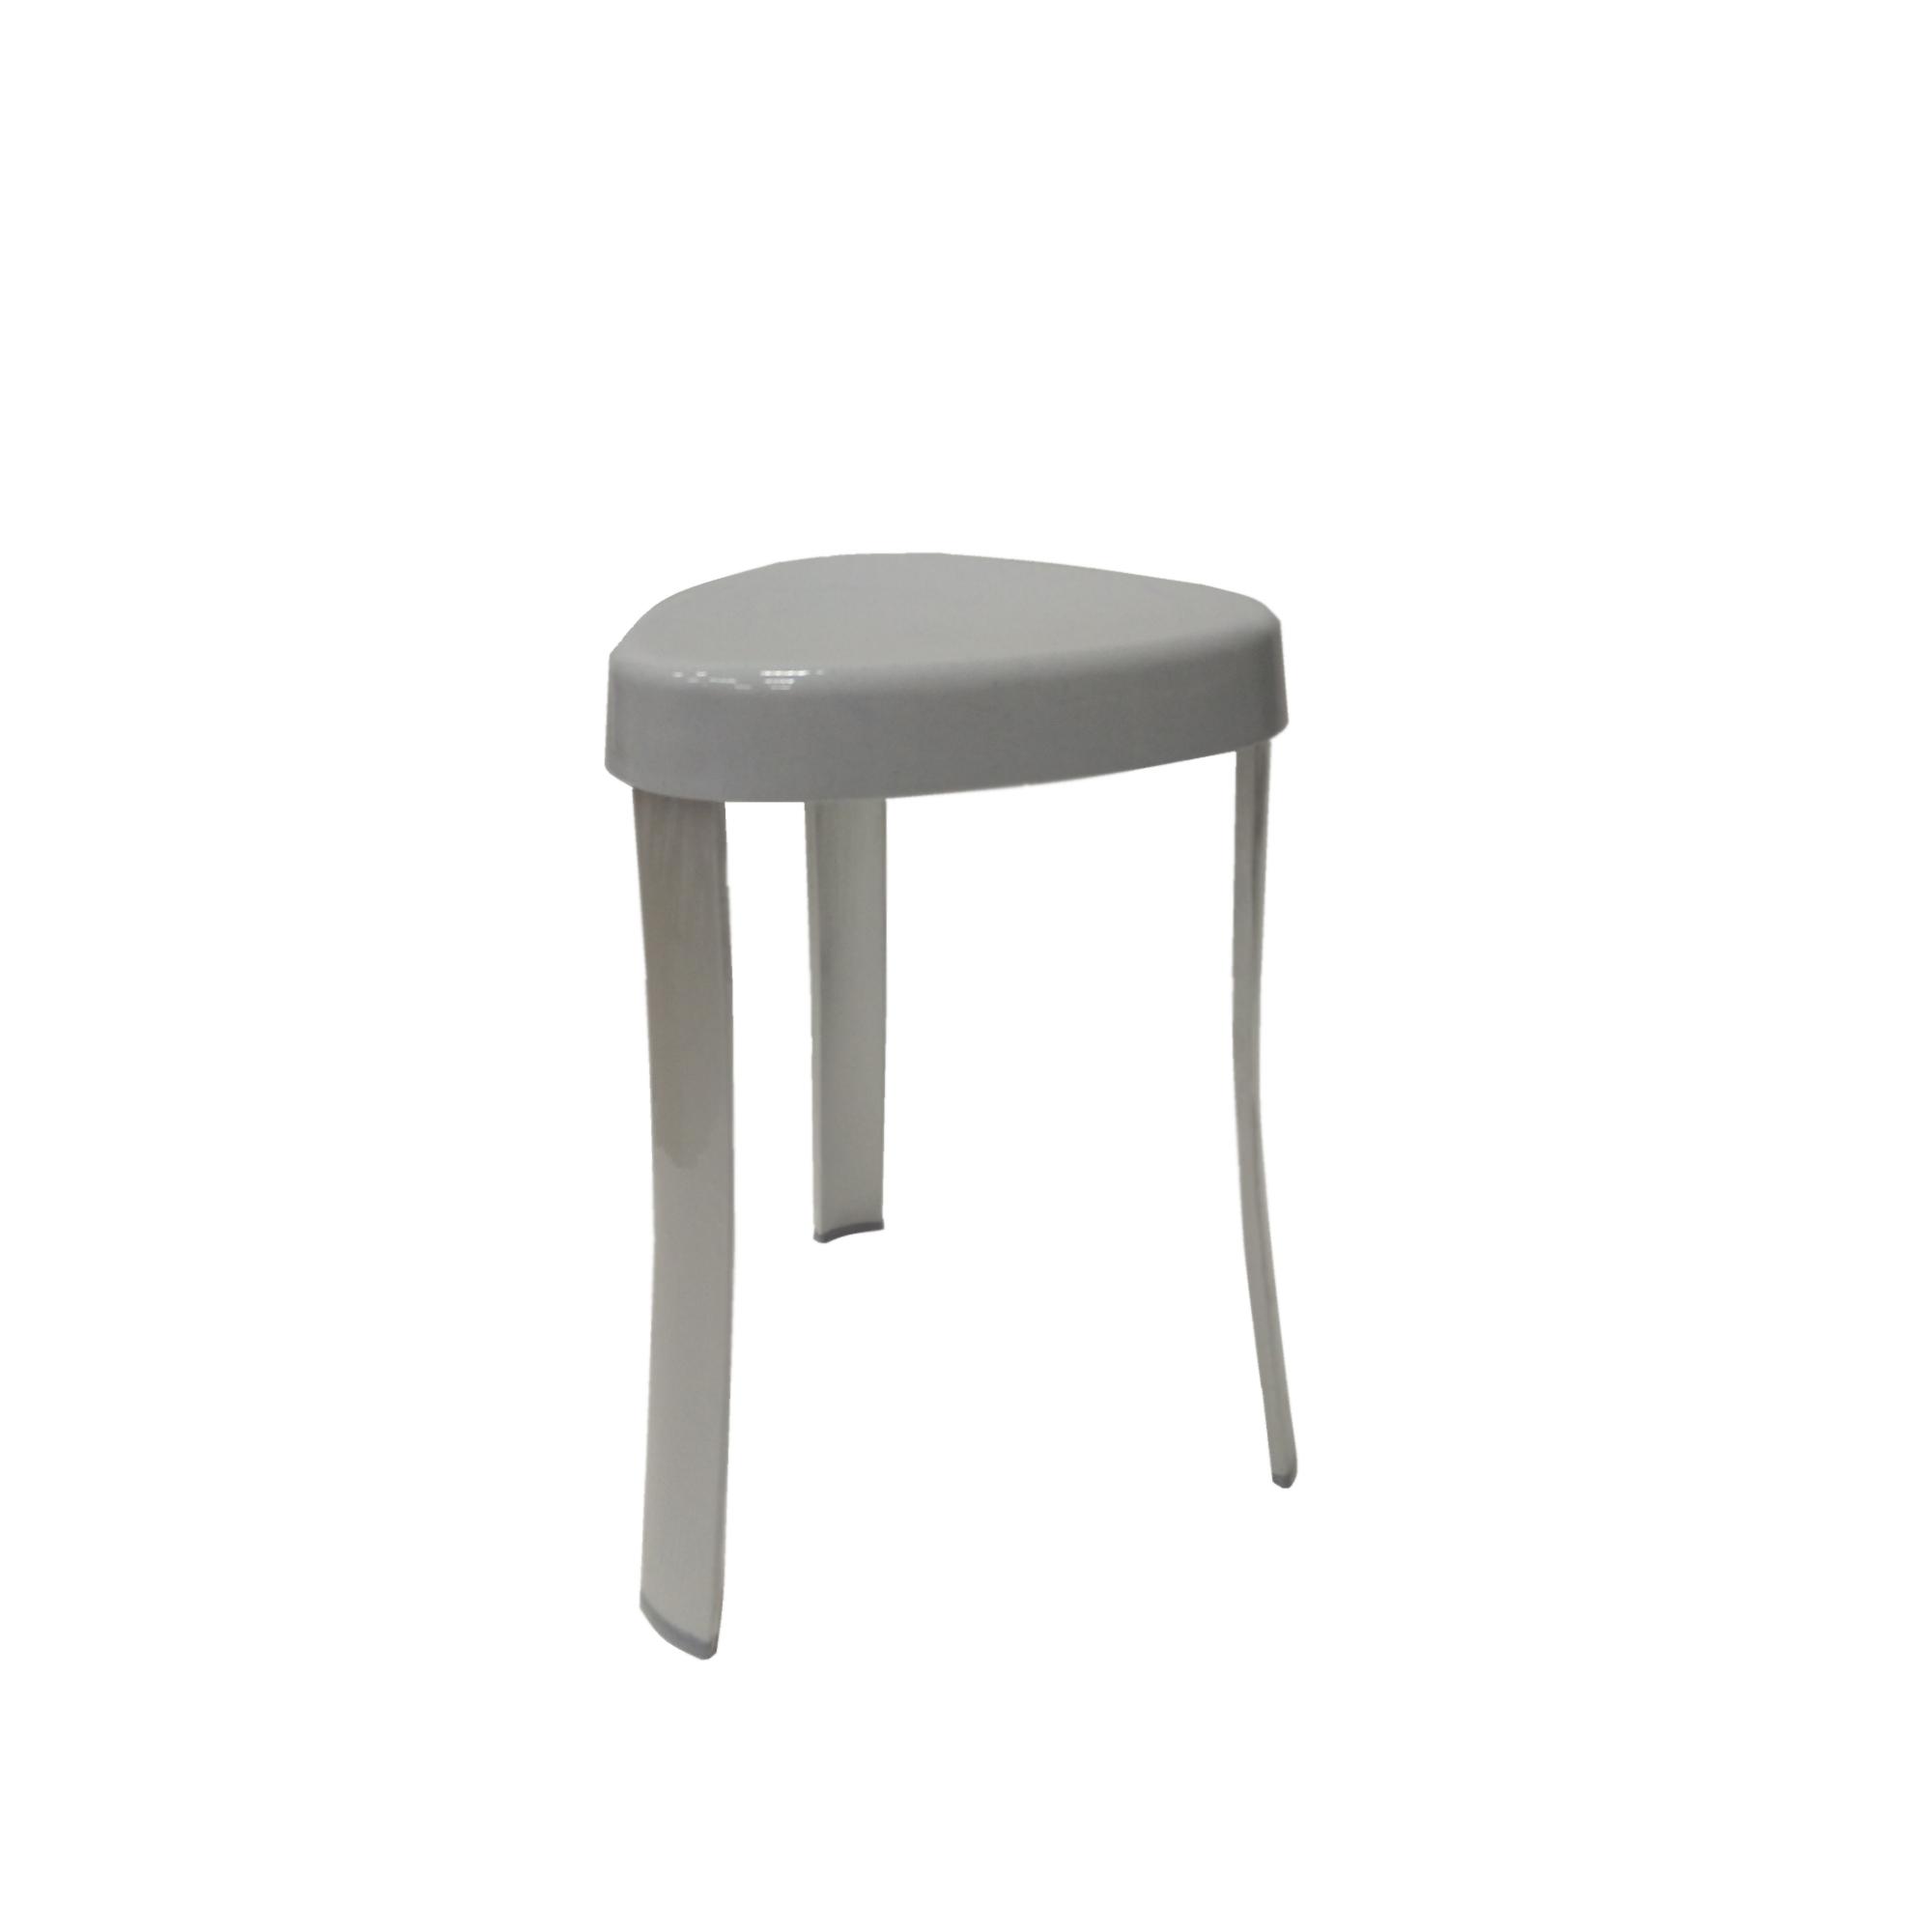 Стул для ванной Primanova серый 25х29х45 см стул для ванной primanova белый25х29х45 см